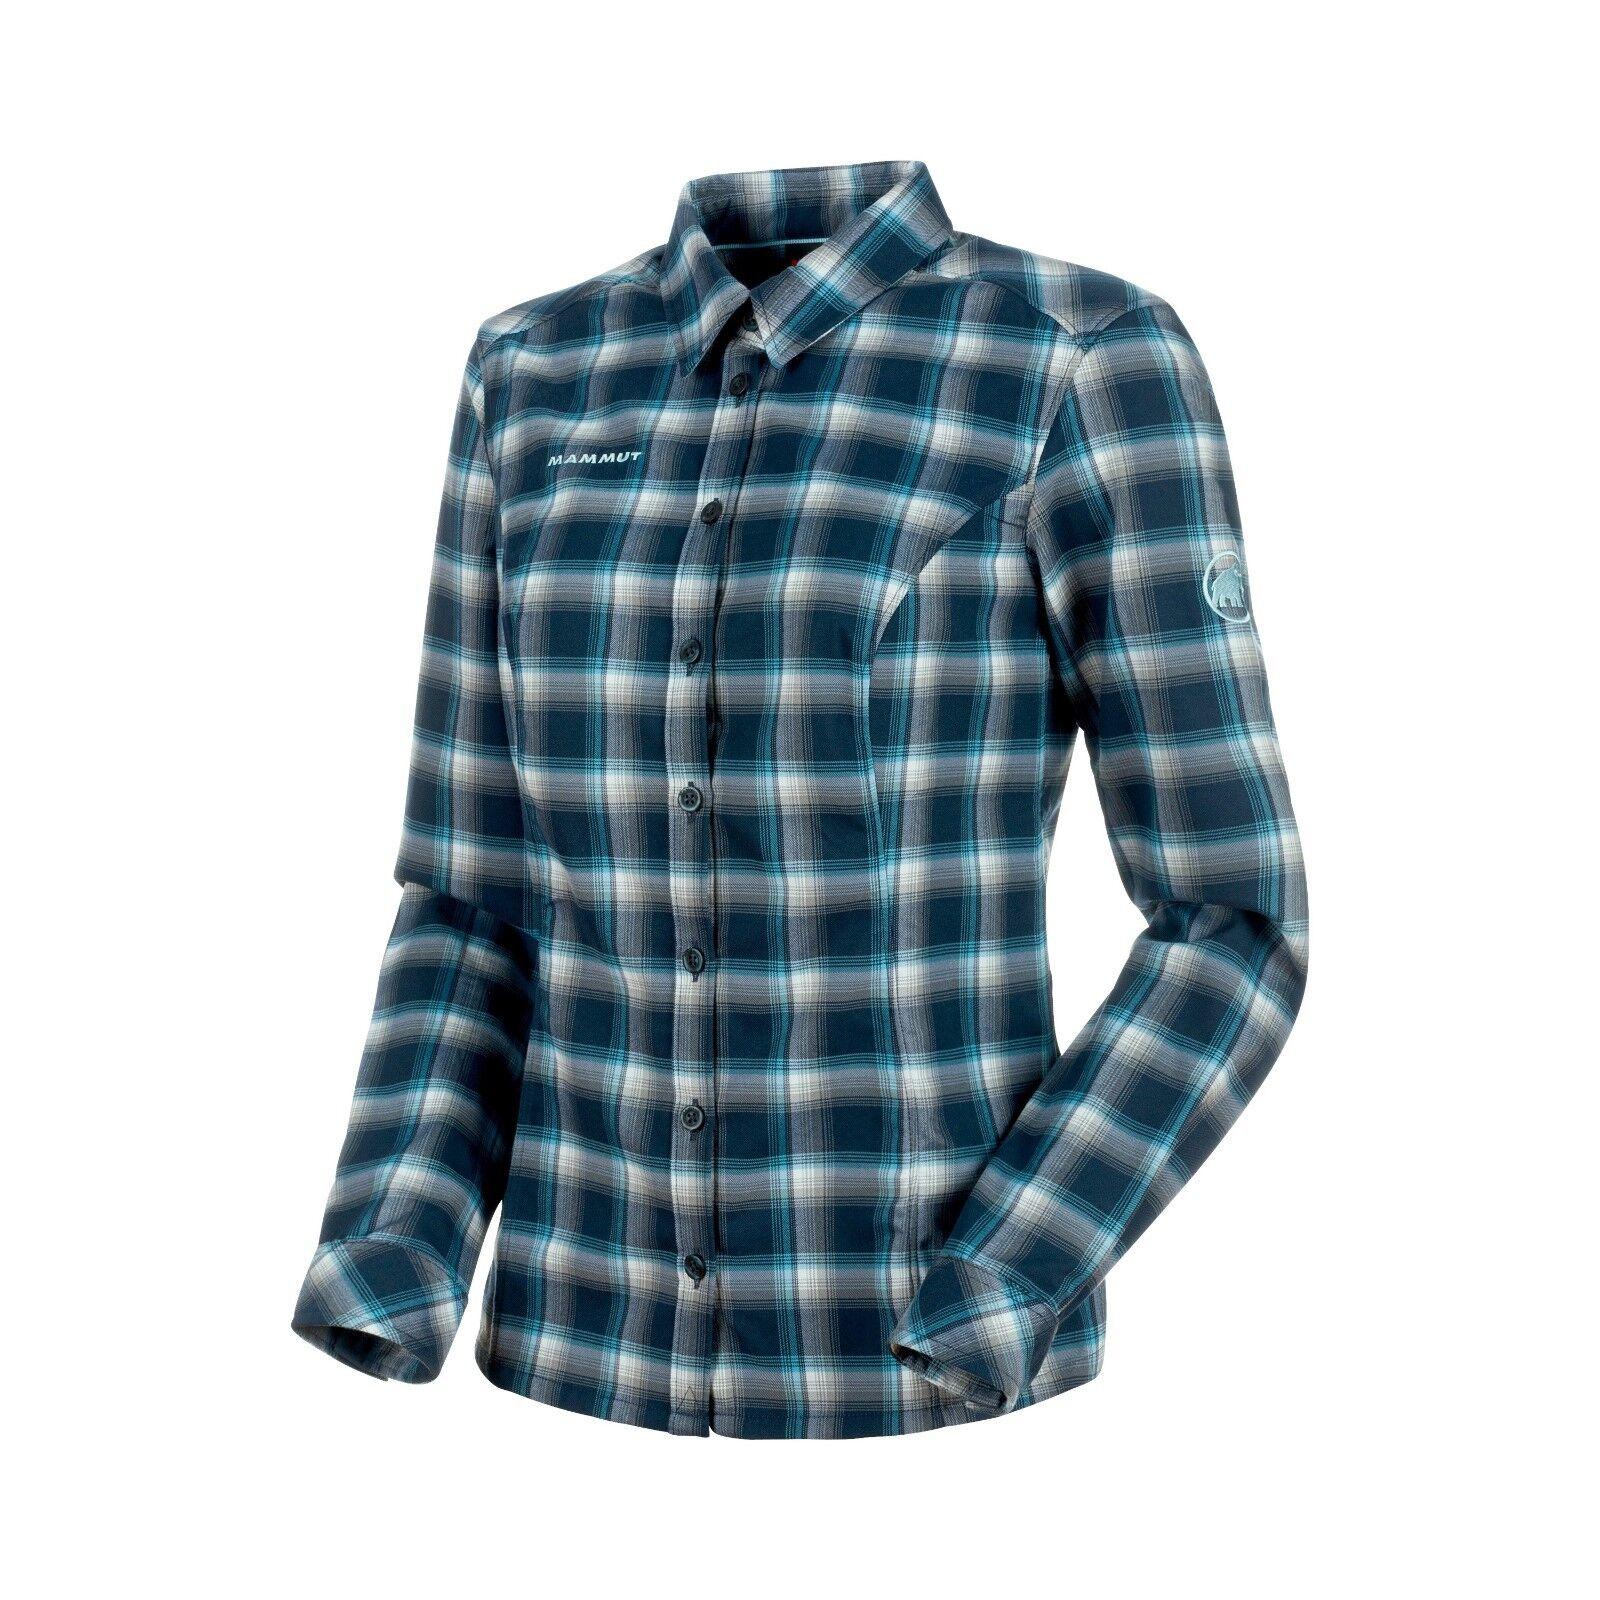 Mammut Alessandria Tour LS Shirt Damens  warmes warmes warmes Langarmhemd für Damen  marine b8e33b